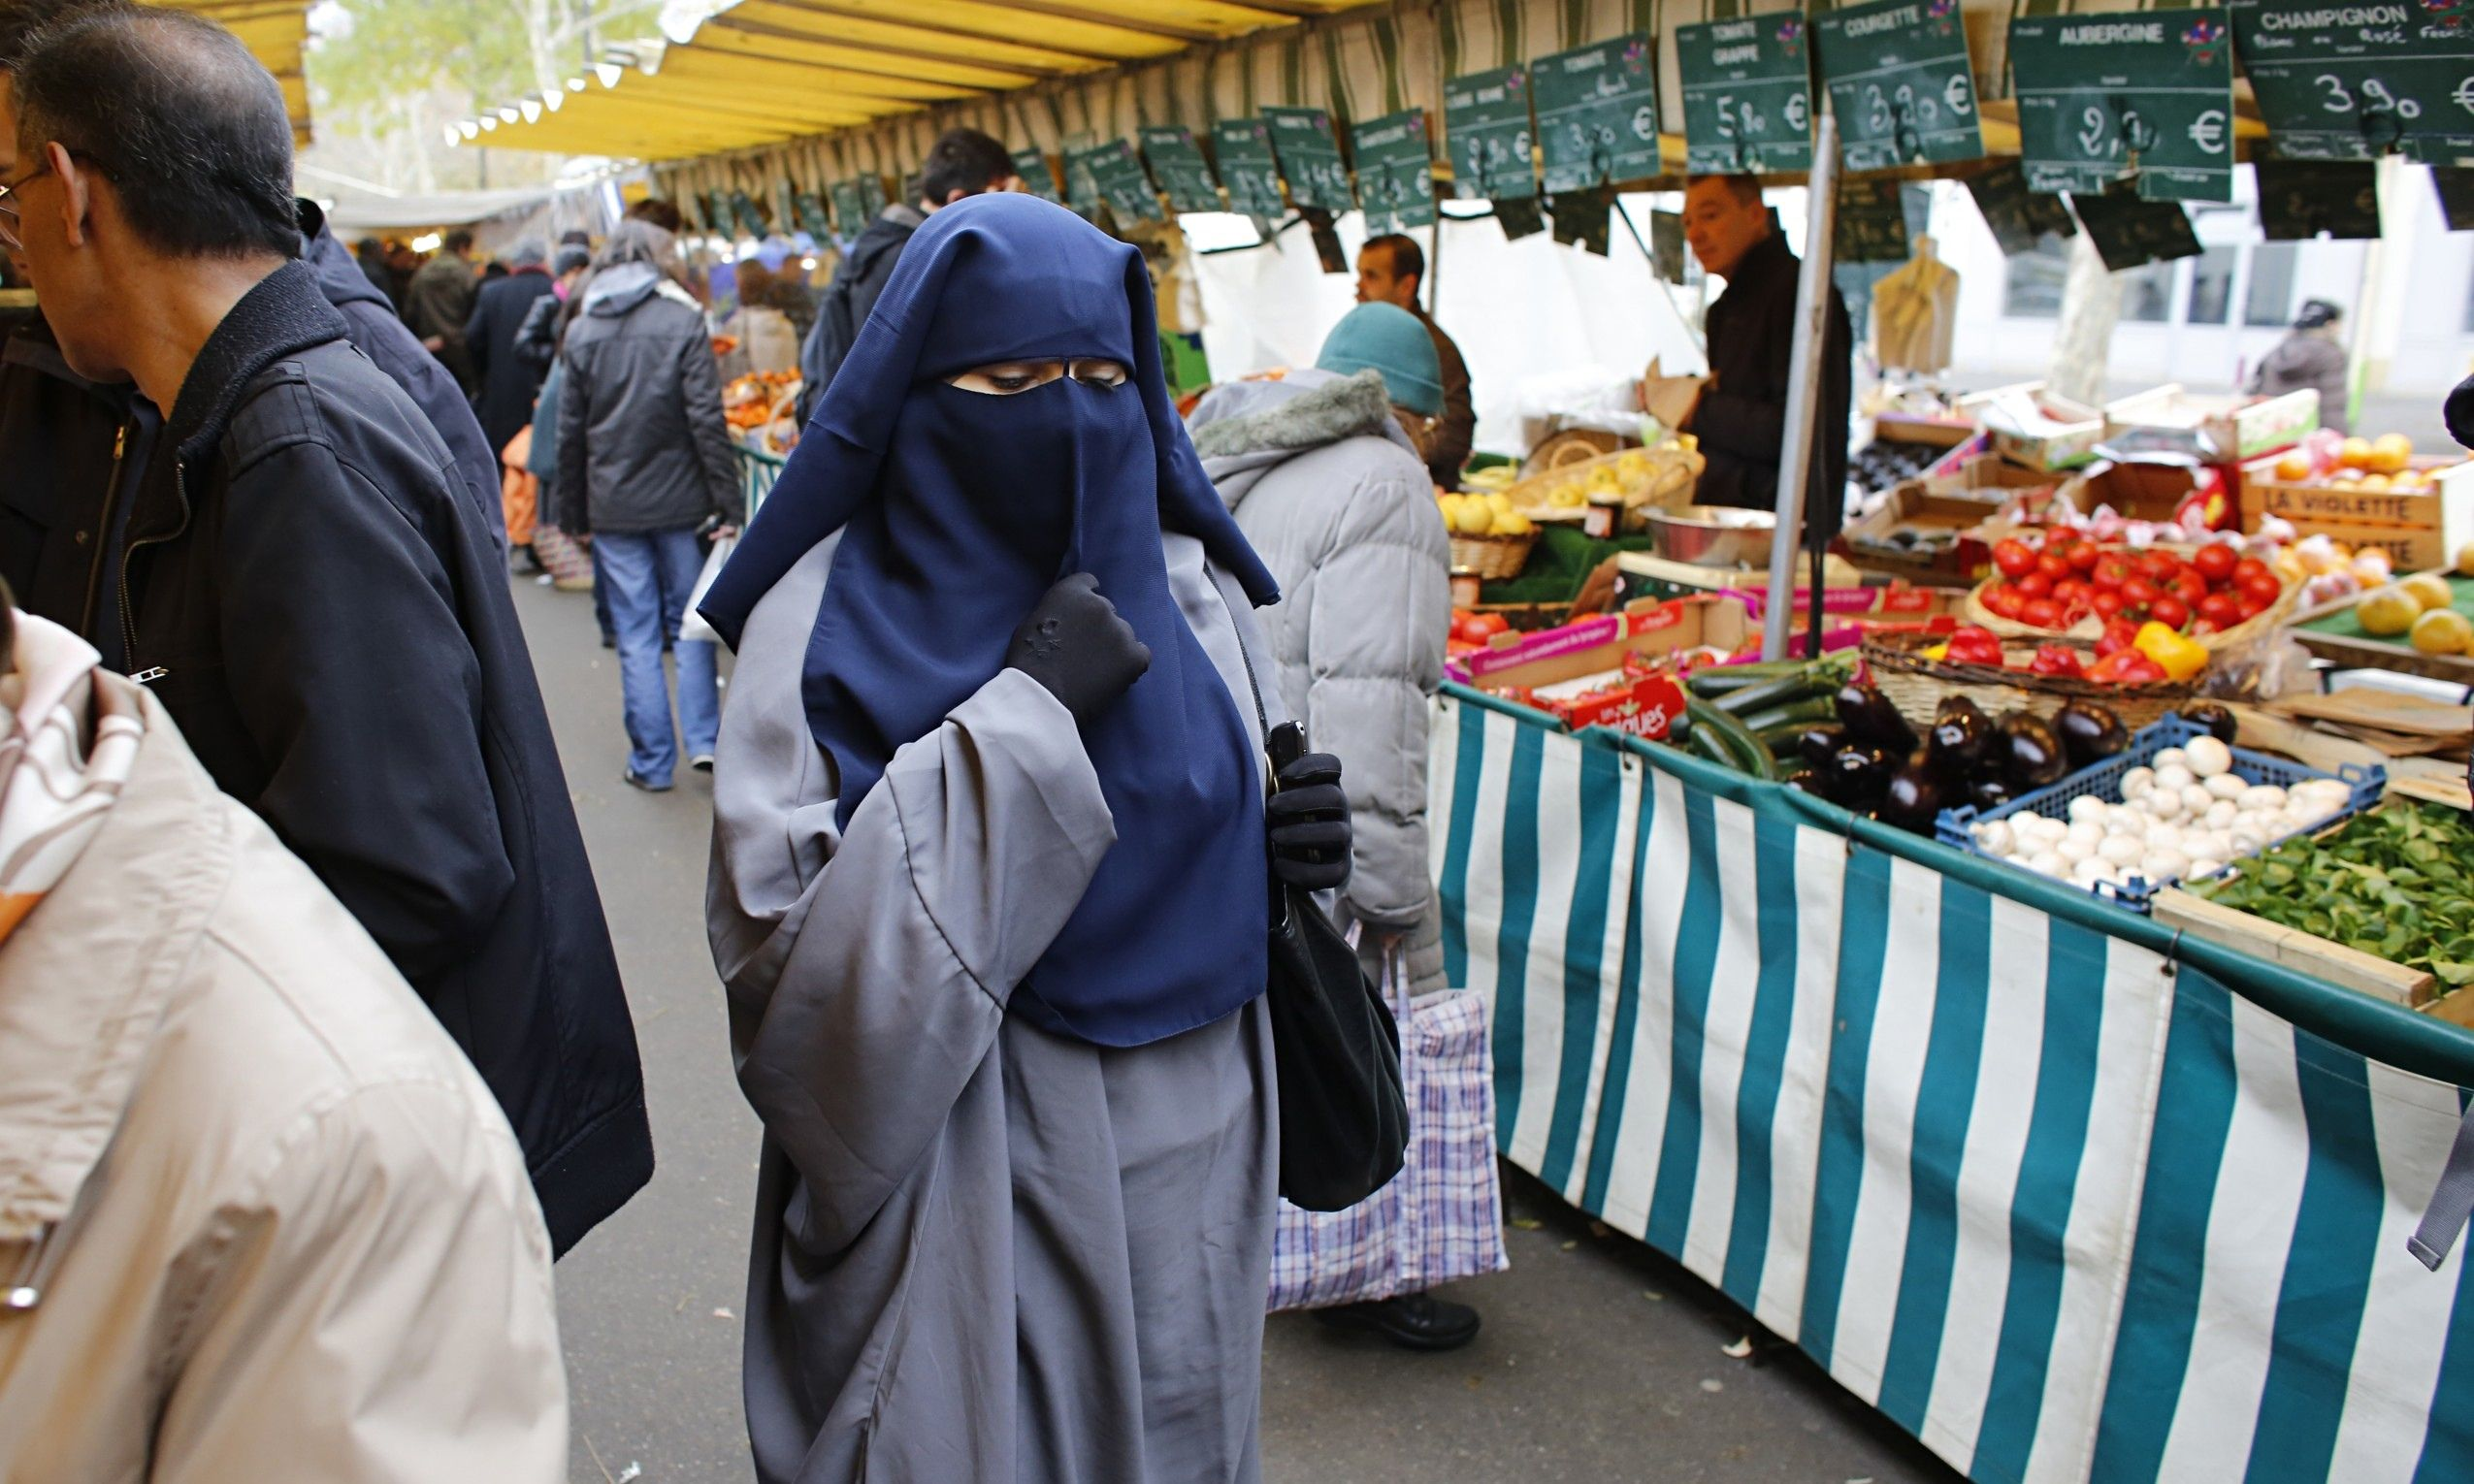 French Muslim Women On Burqa Ban Ruling All I Want Is To Live In Peace Muslim Women Burqa Women